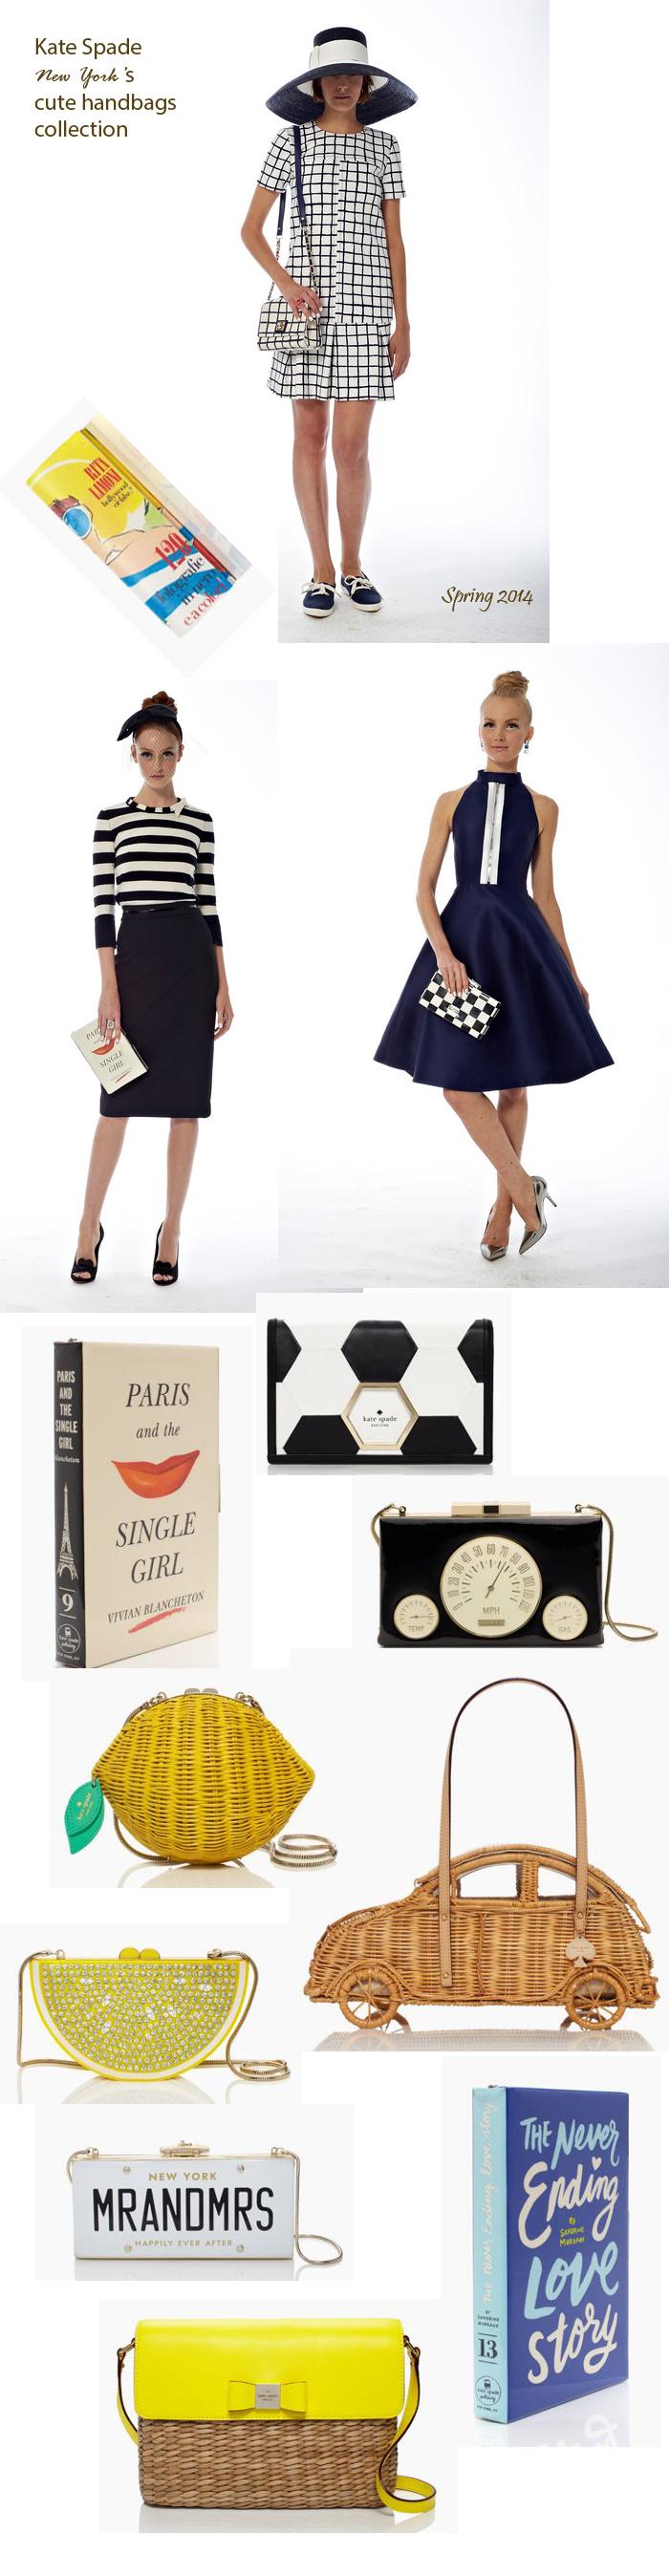 fashion kate spade New York cute handbags collection purse clutch